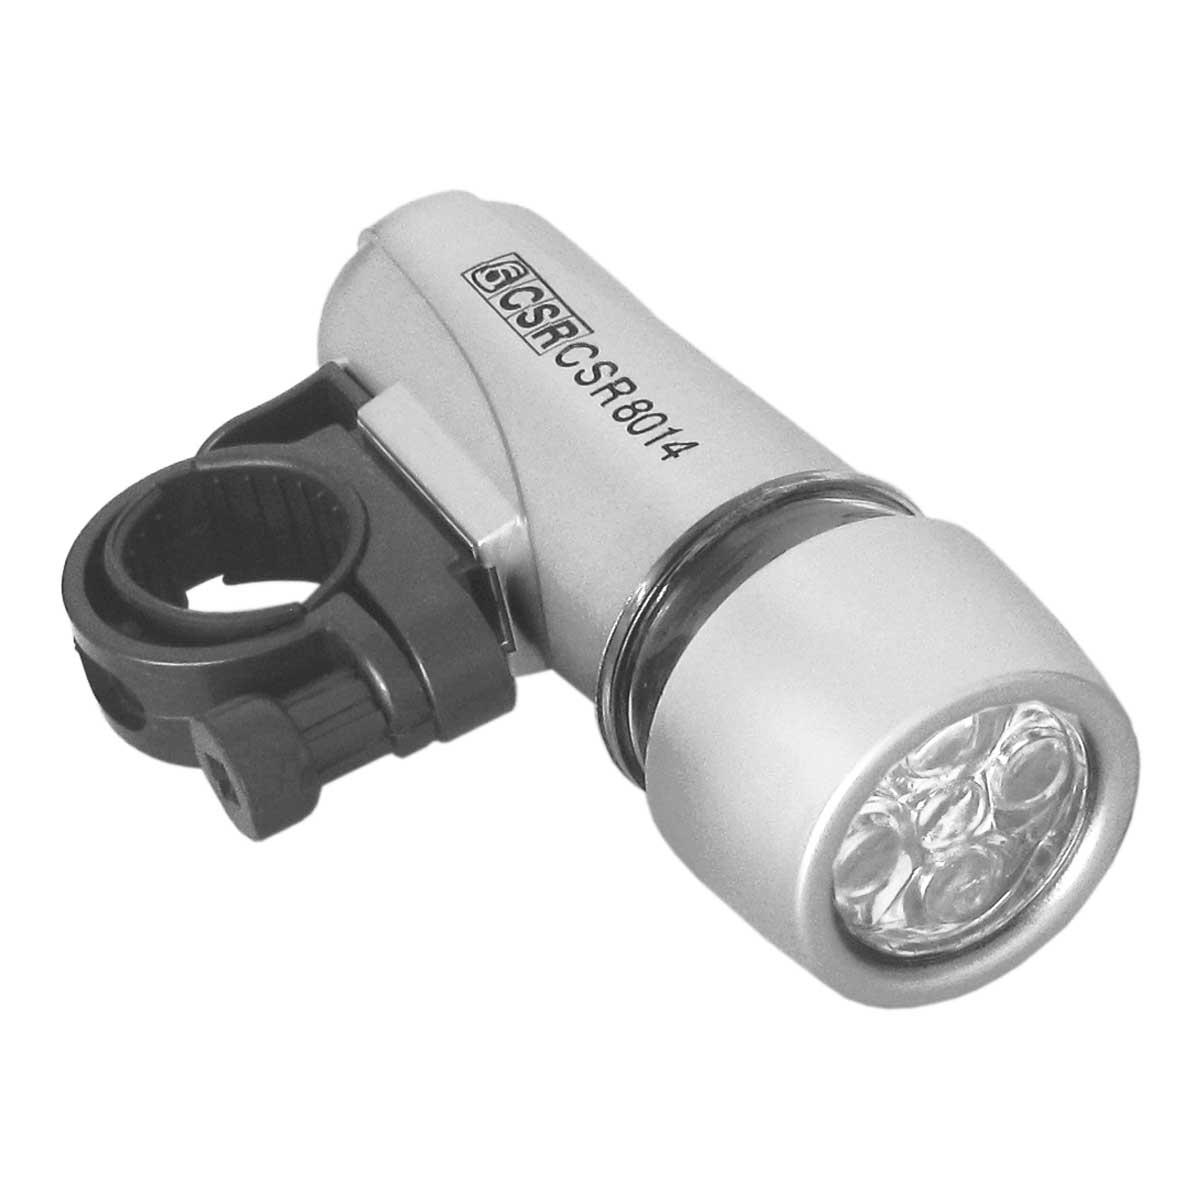 HX8014 - Kit de Lanternas para Bicicleta 5 LEDs HX 8014 - CSR